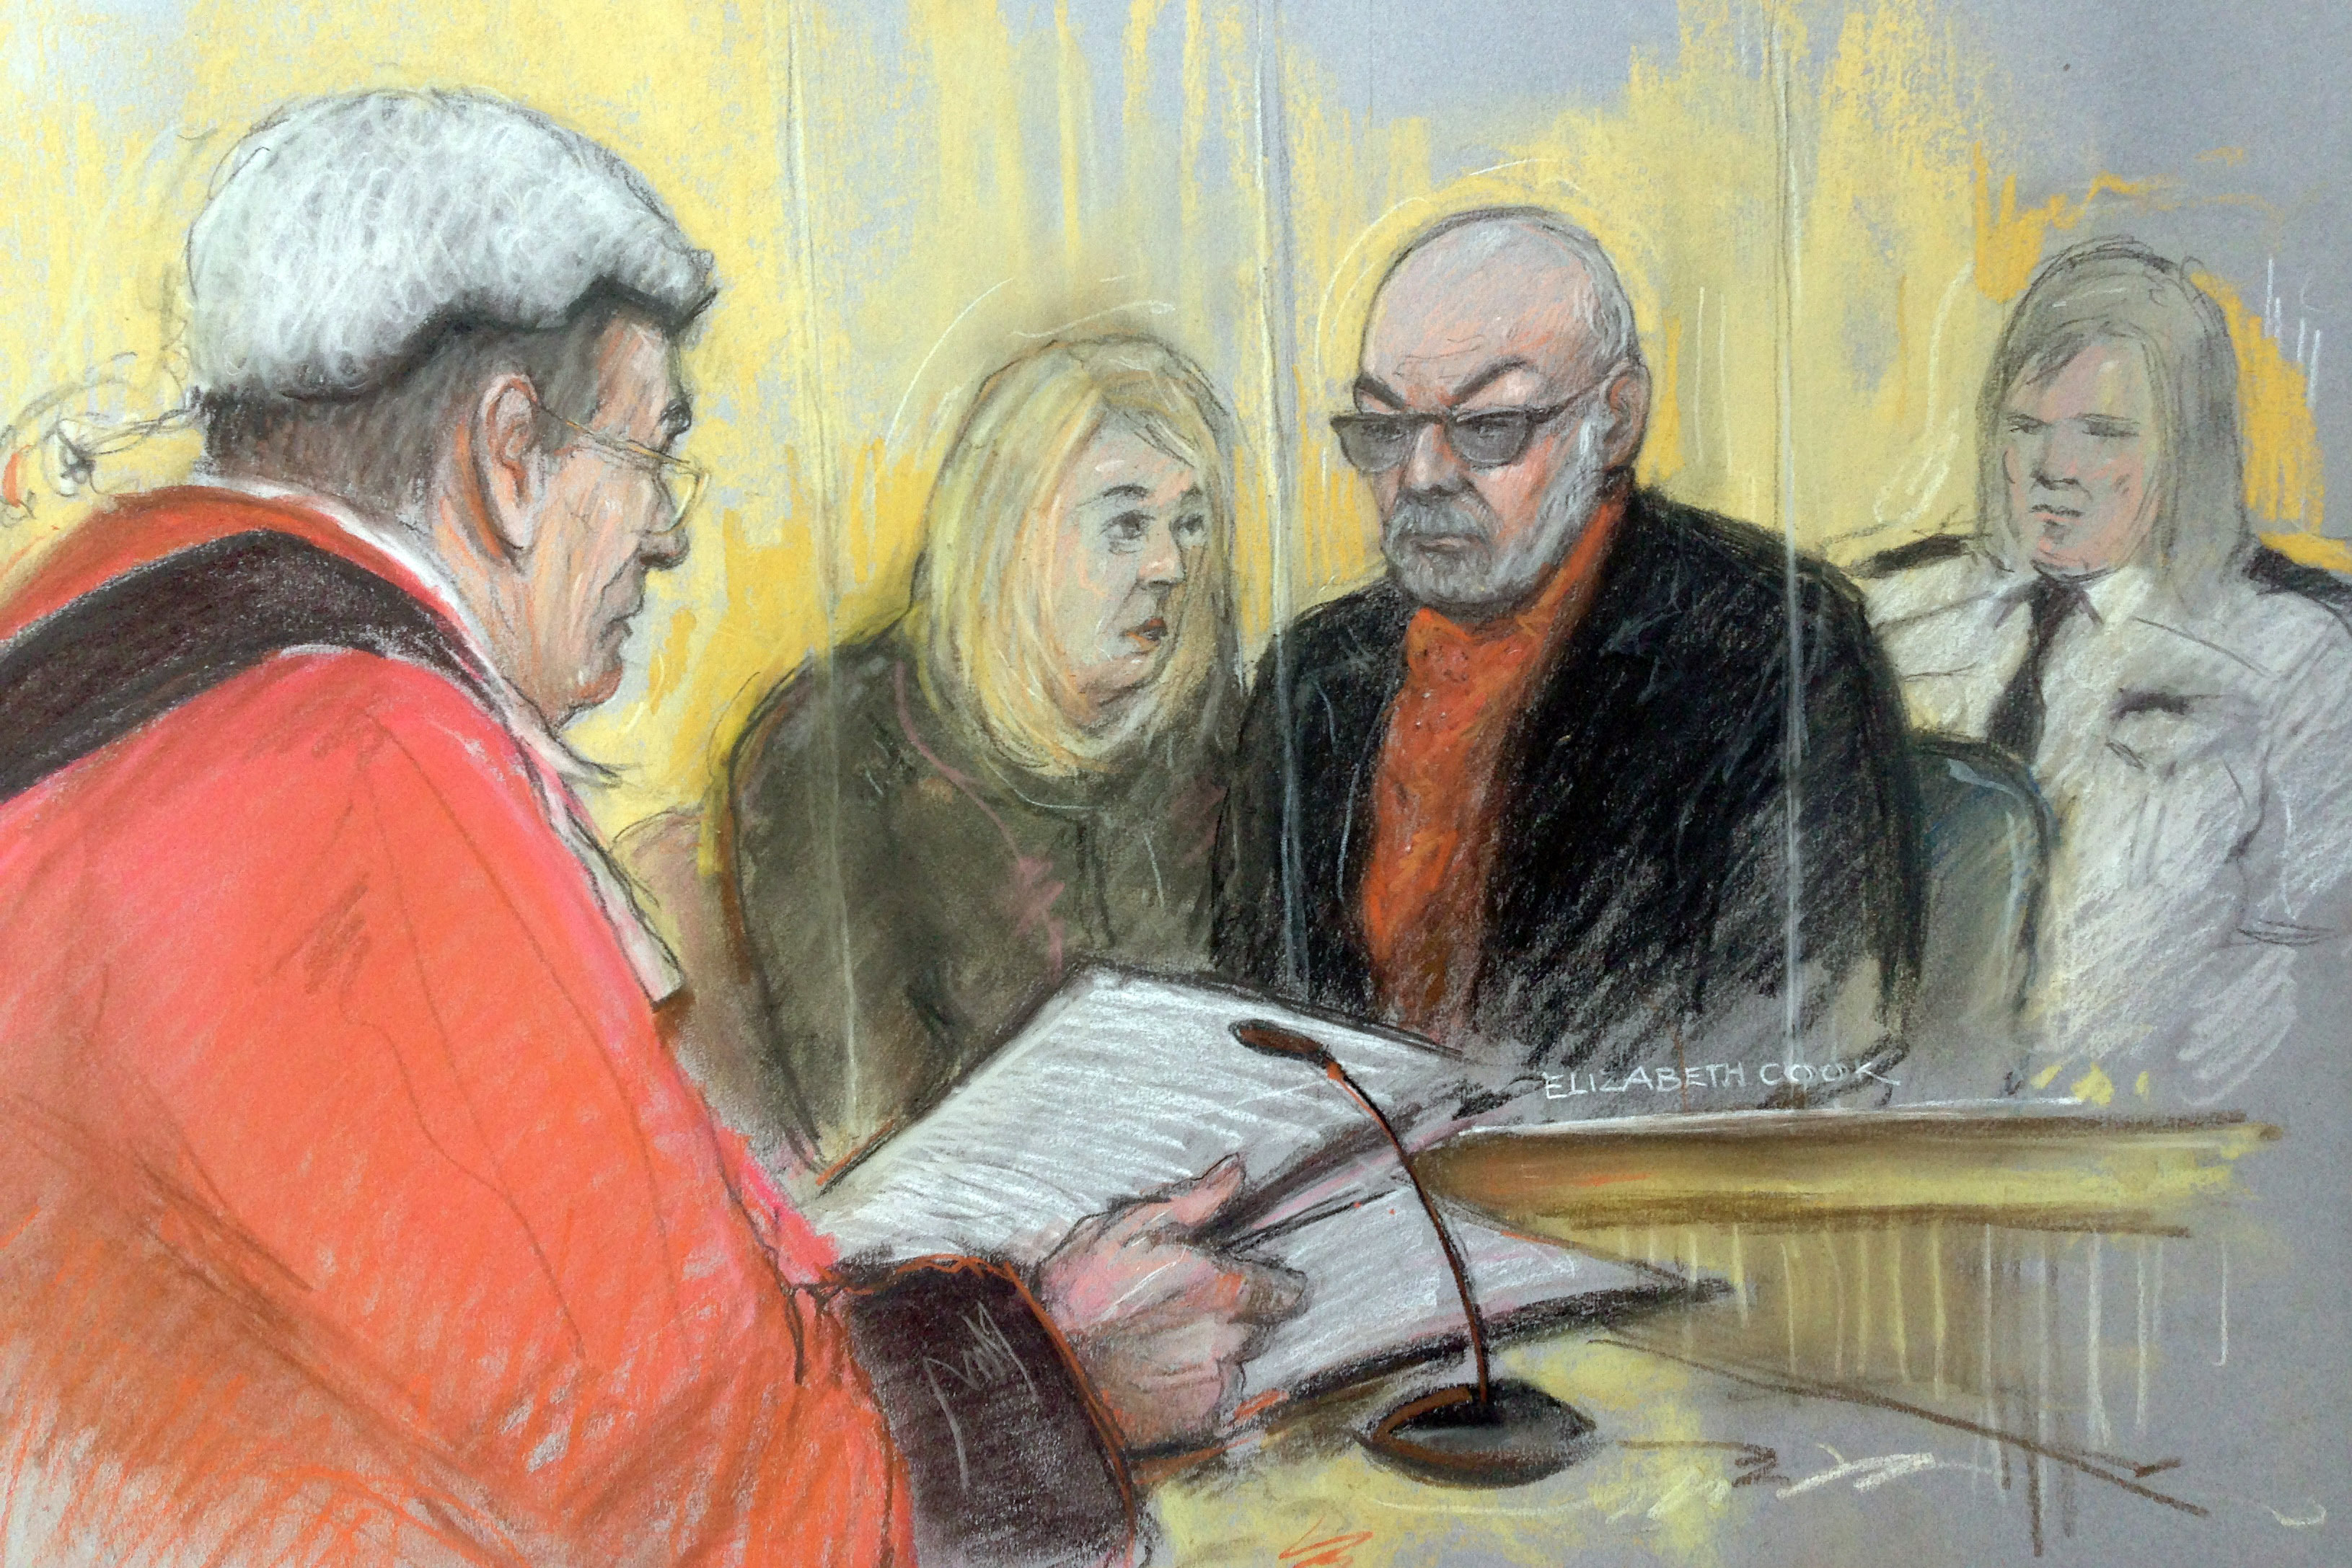 Rocker Gary Glitter Jailed For 16 Years For Child Sex Abuse